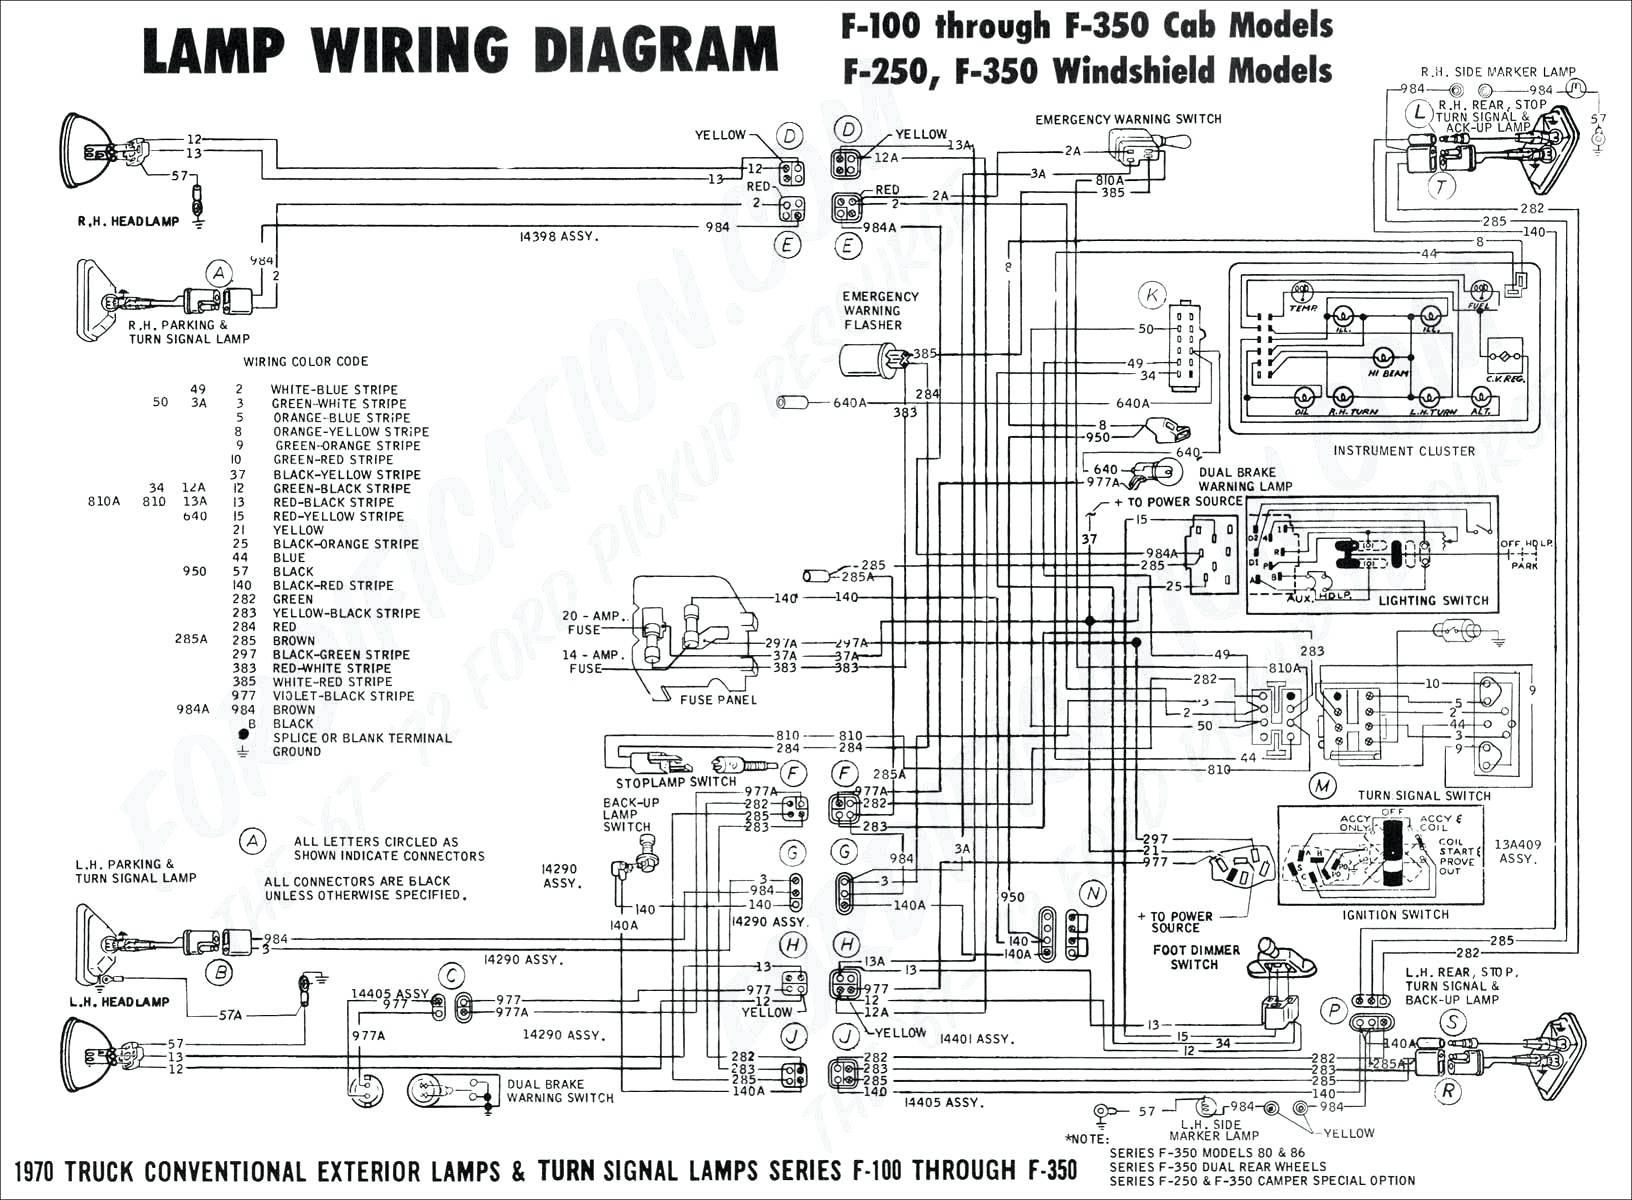 2007 Dodge Ram 1500 Can B Diagram 1998 Dodge Ram 150engine Diagram Diagram Base Website Of 2007 Dodge Ram 1500 Can B Diagram